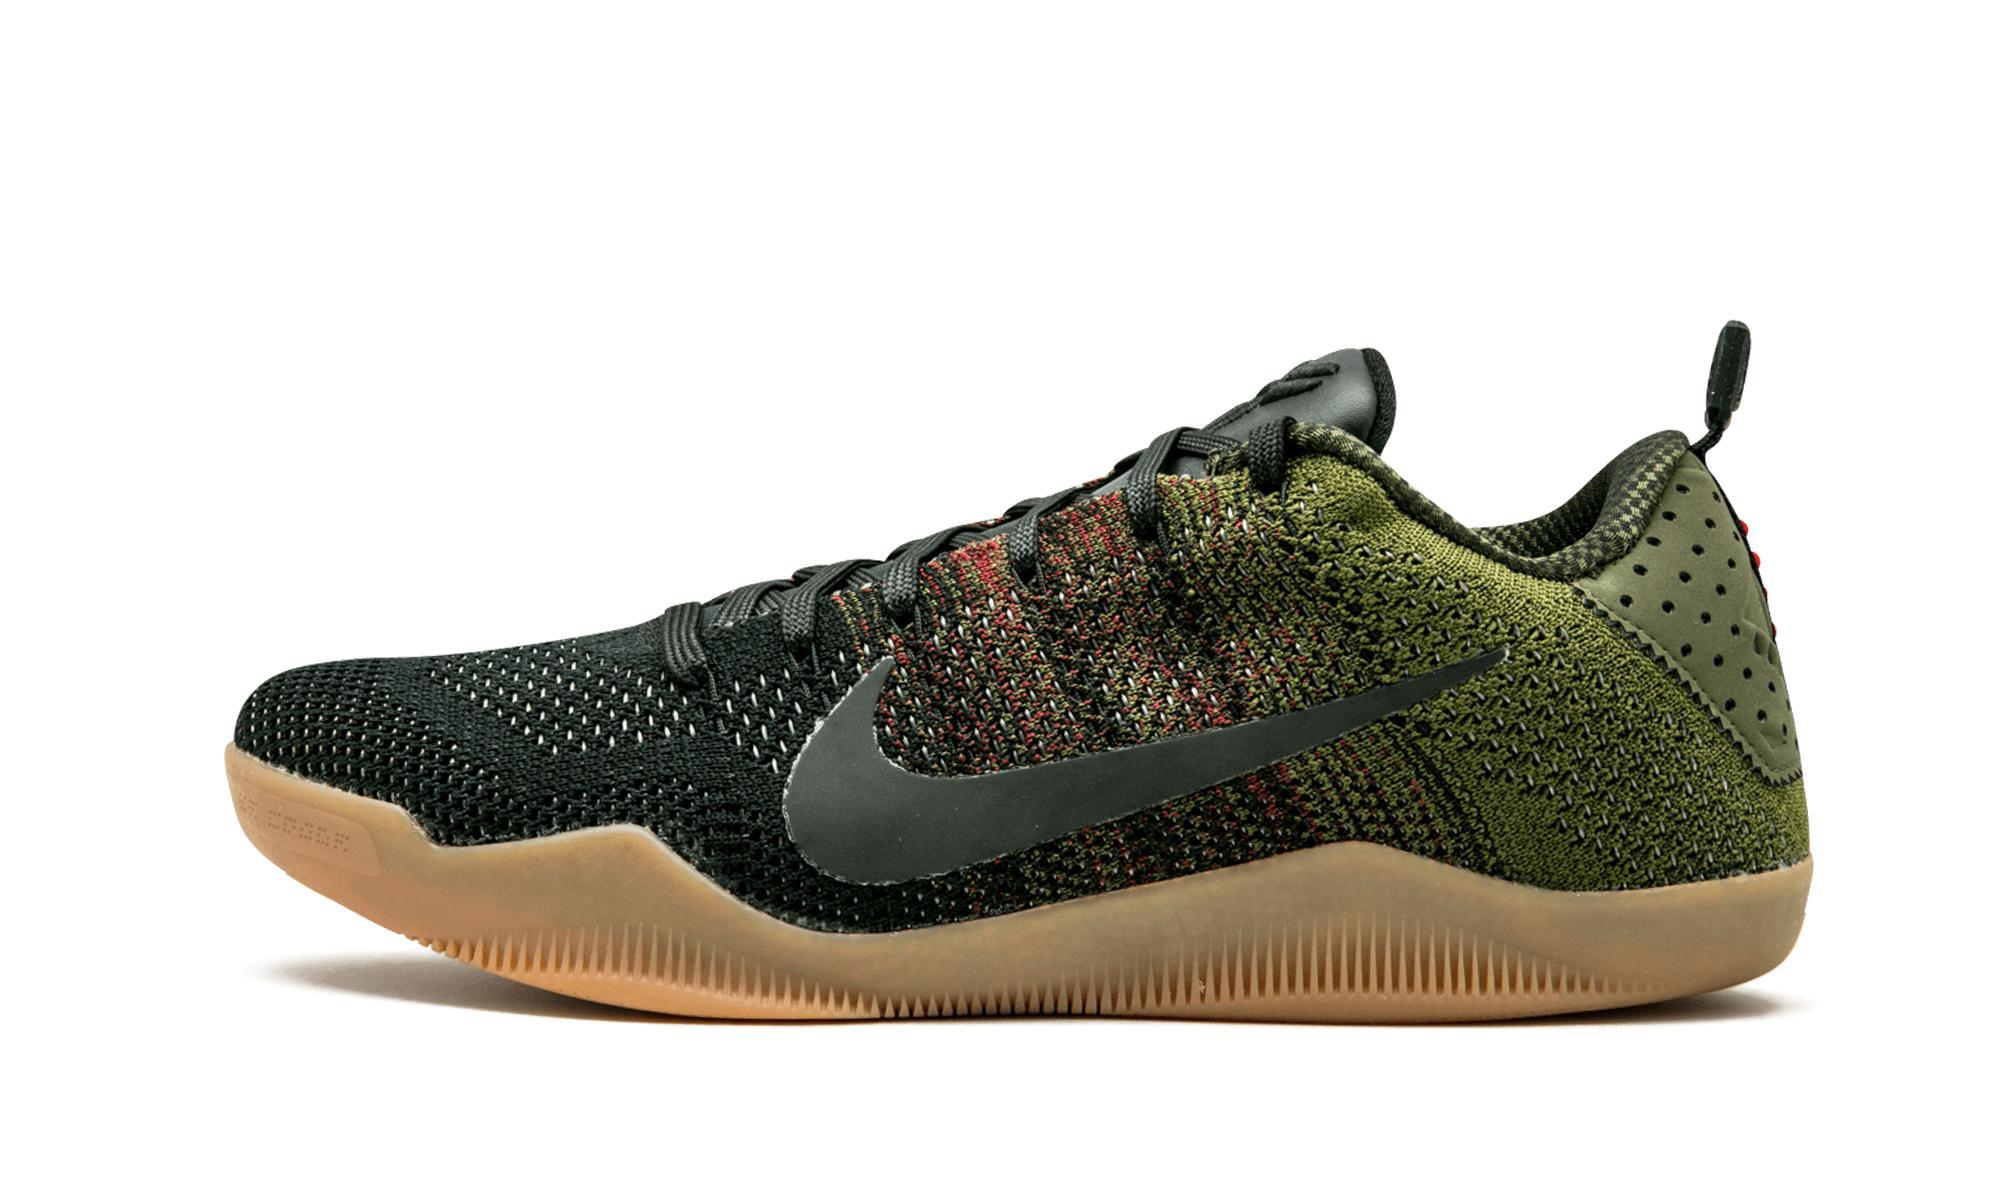 a17145031c9 Lyst - Nike Kobe 11 Elite Low 4kb for Men